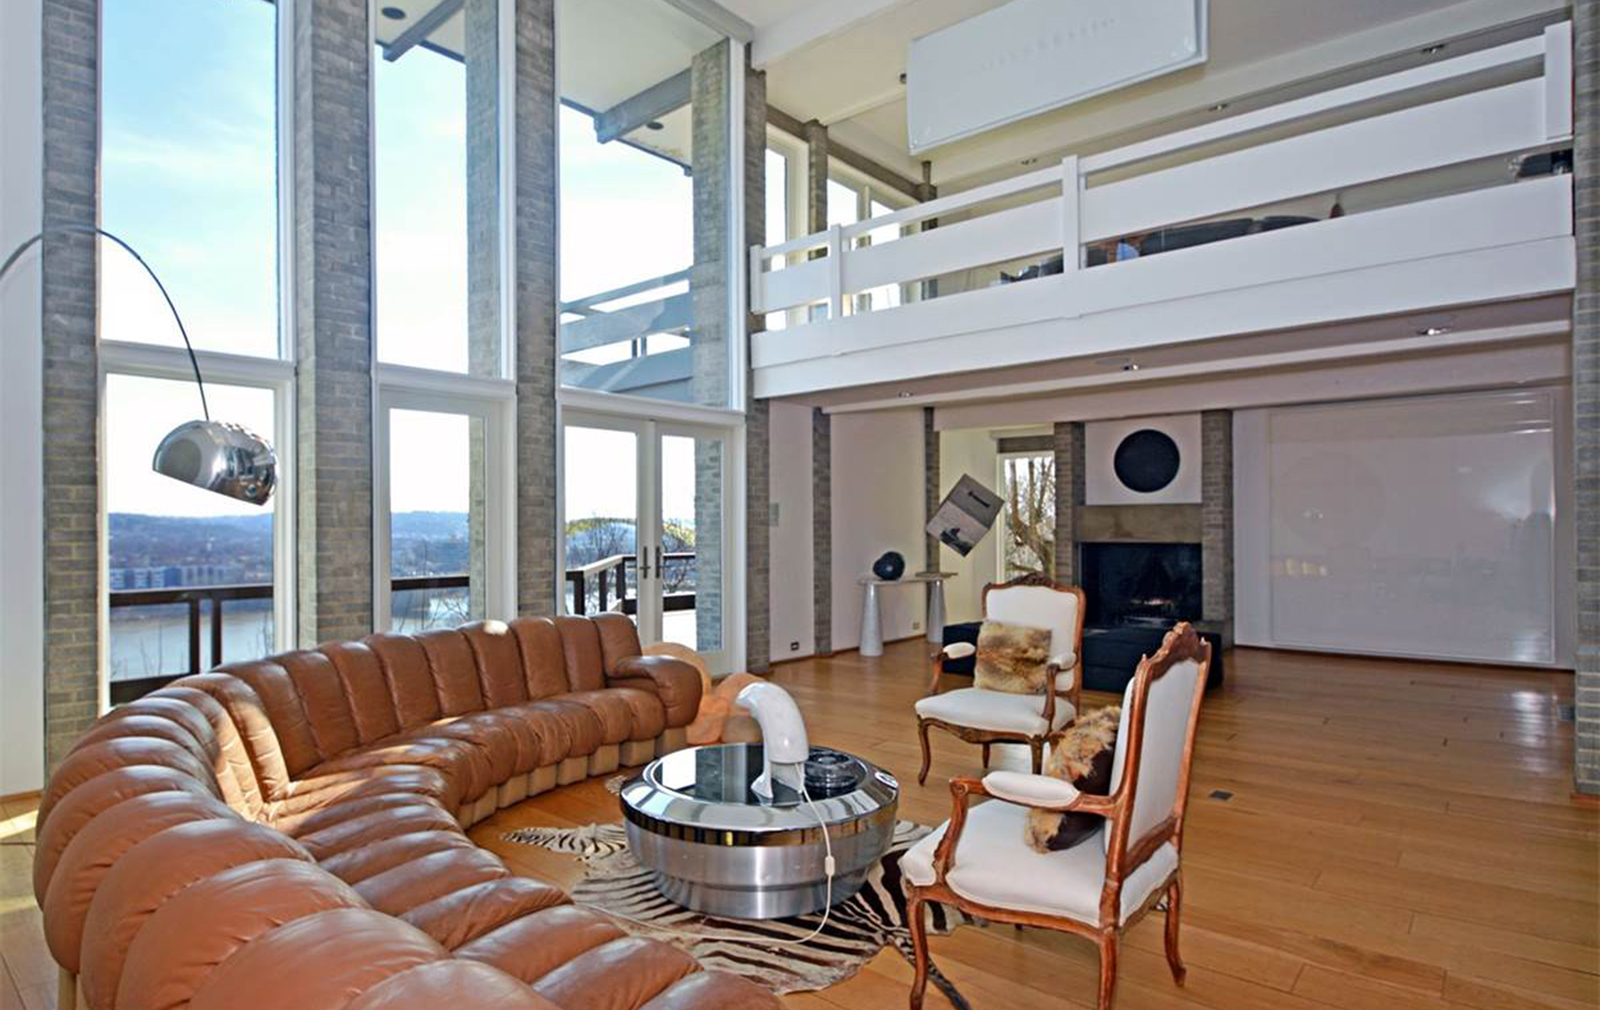 Vidal Sassoon's Cincinnati home for sale